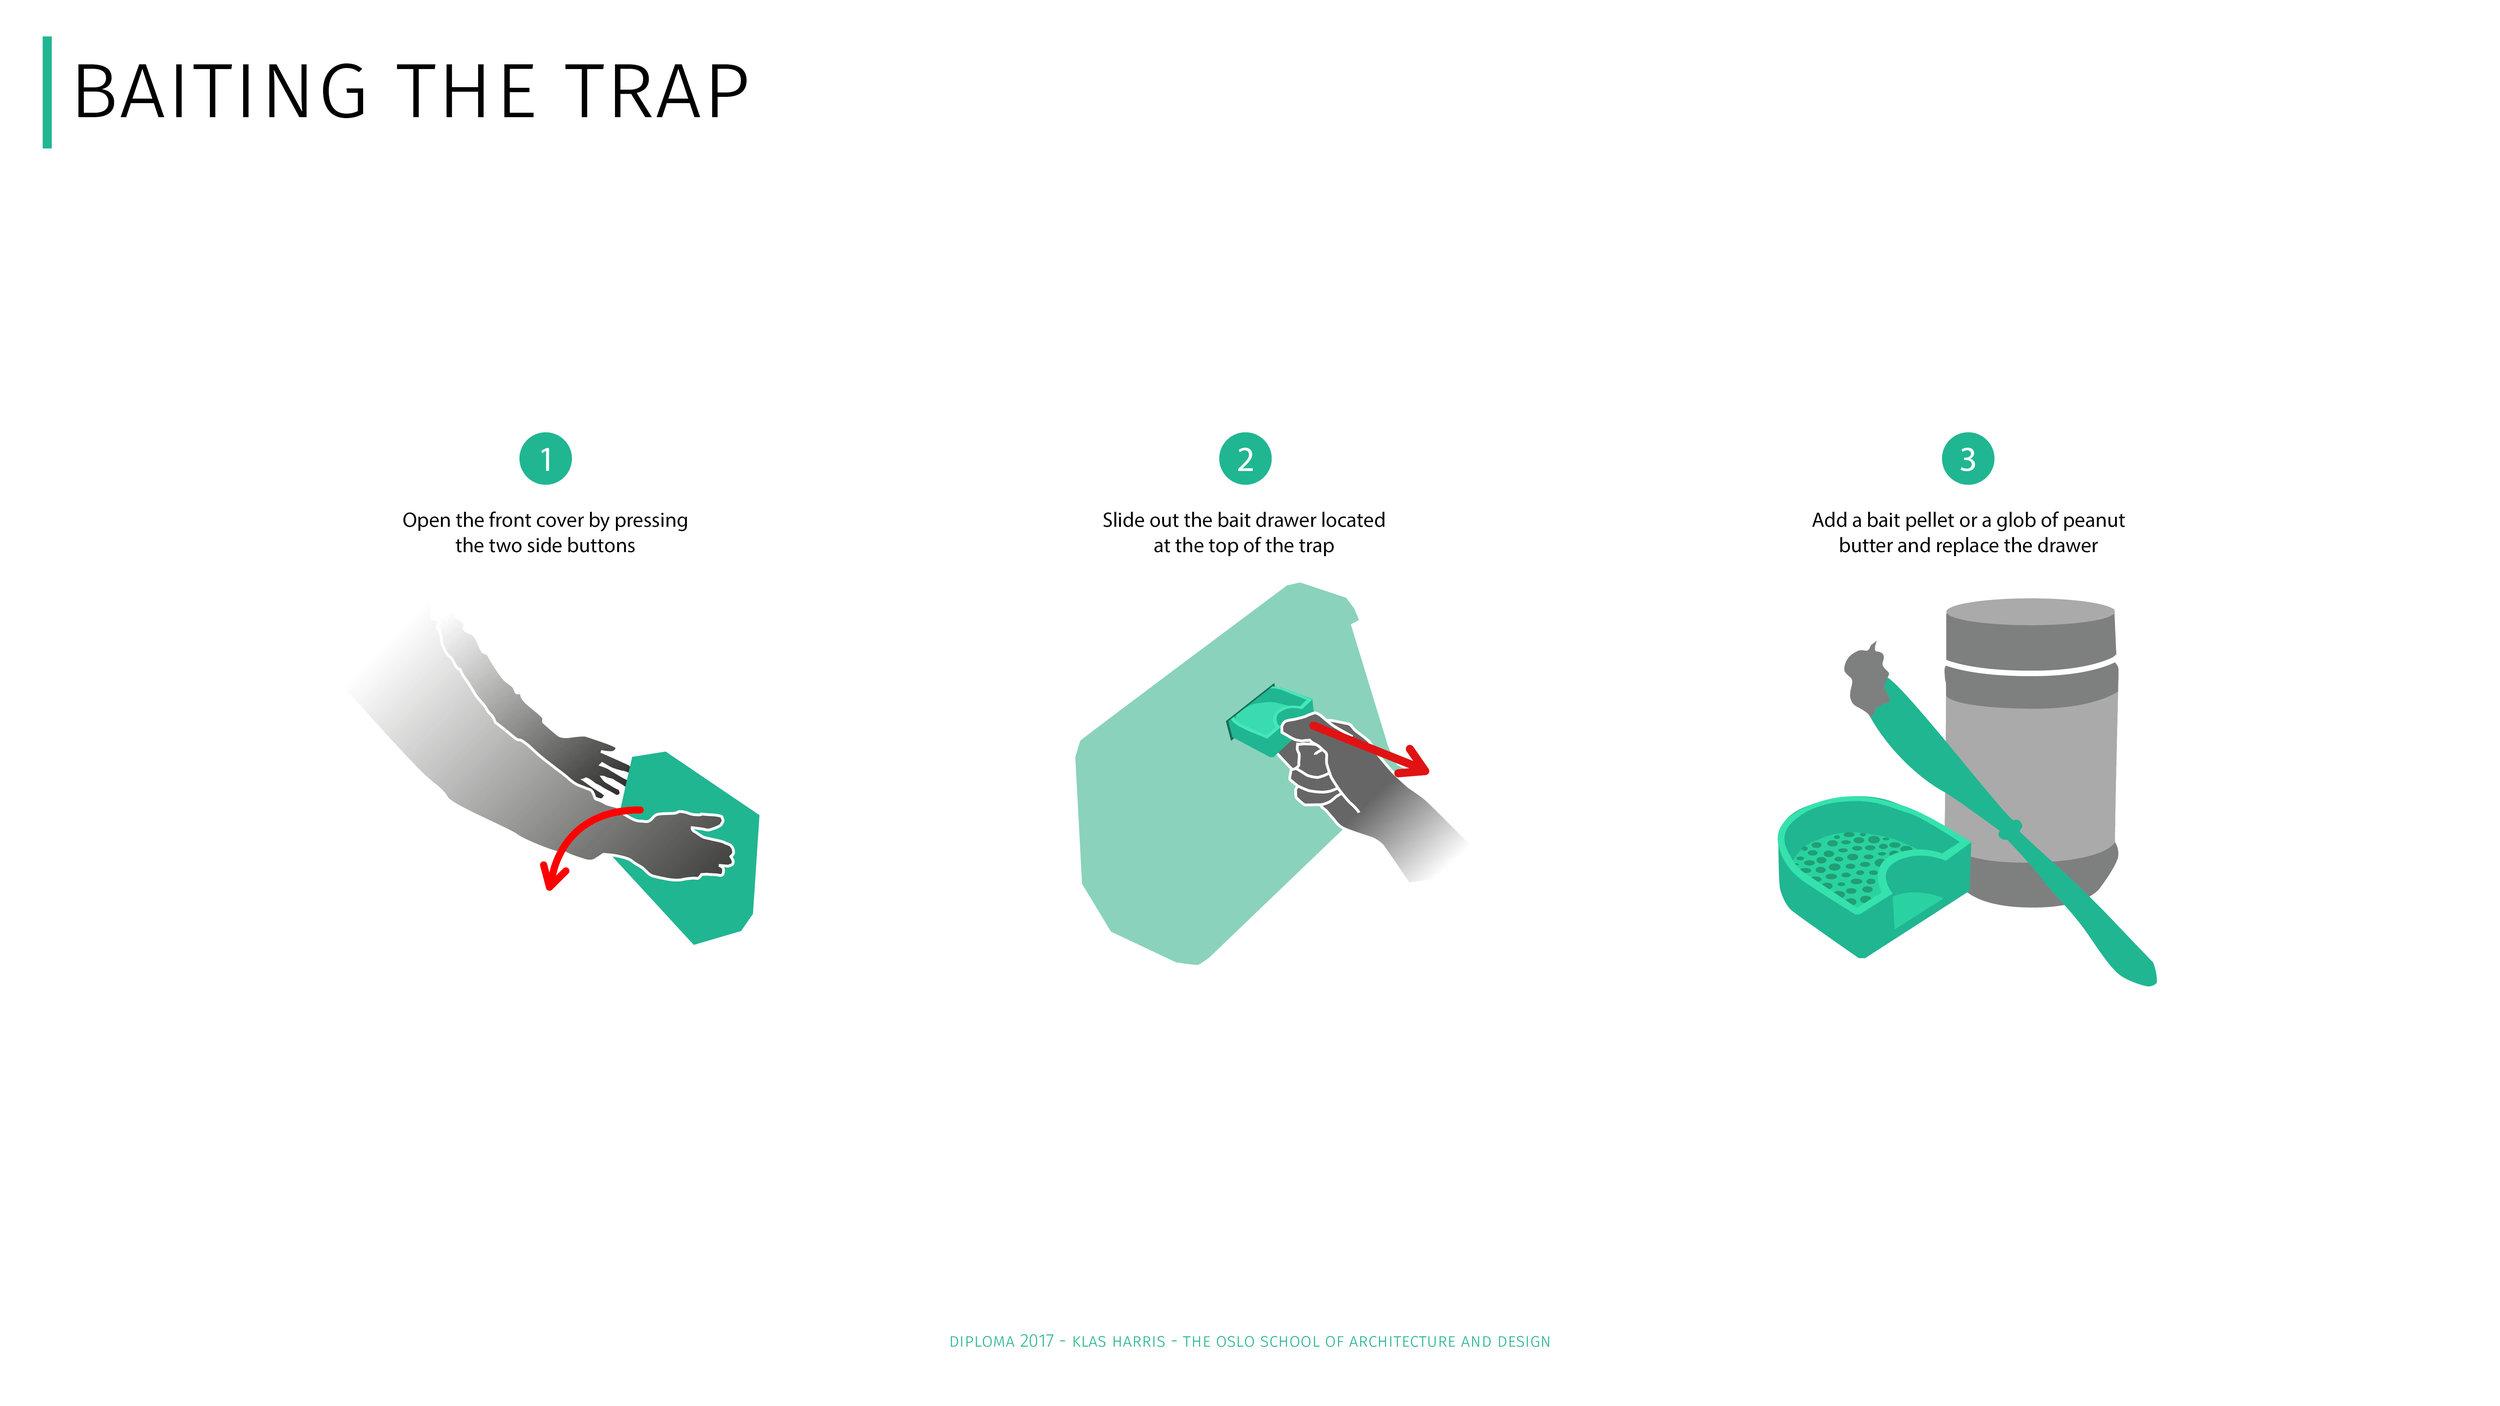 Baiting the trap.jpg